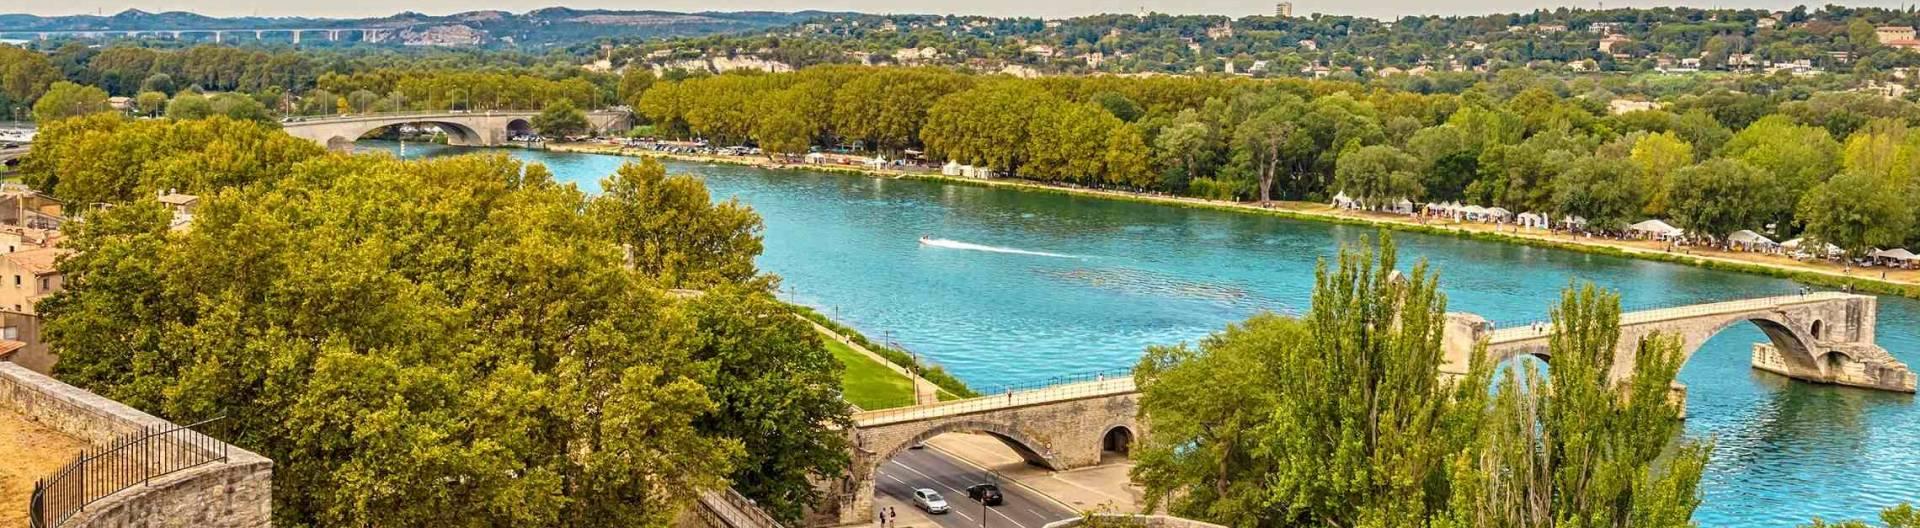 Rhonejoki-Avignon-Ranska-1920x528.jpg